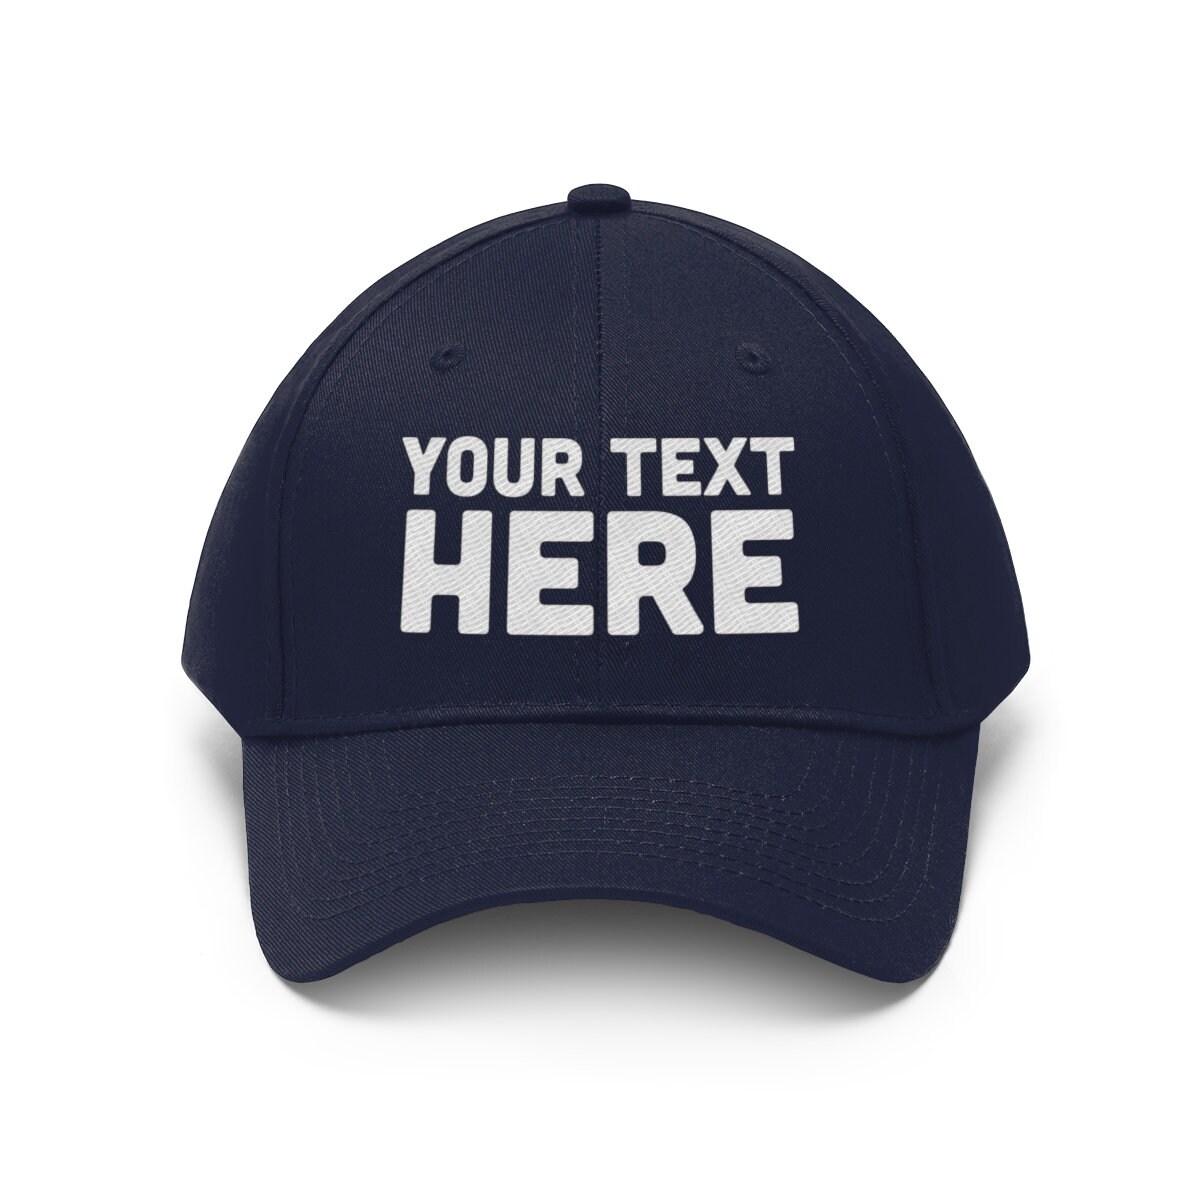 fcdf80516f66b Custom Unisex Twill Hat - Personalized Embroidered Dad Hat ...